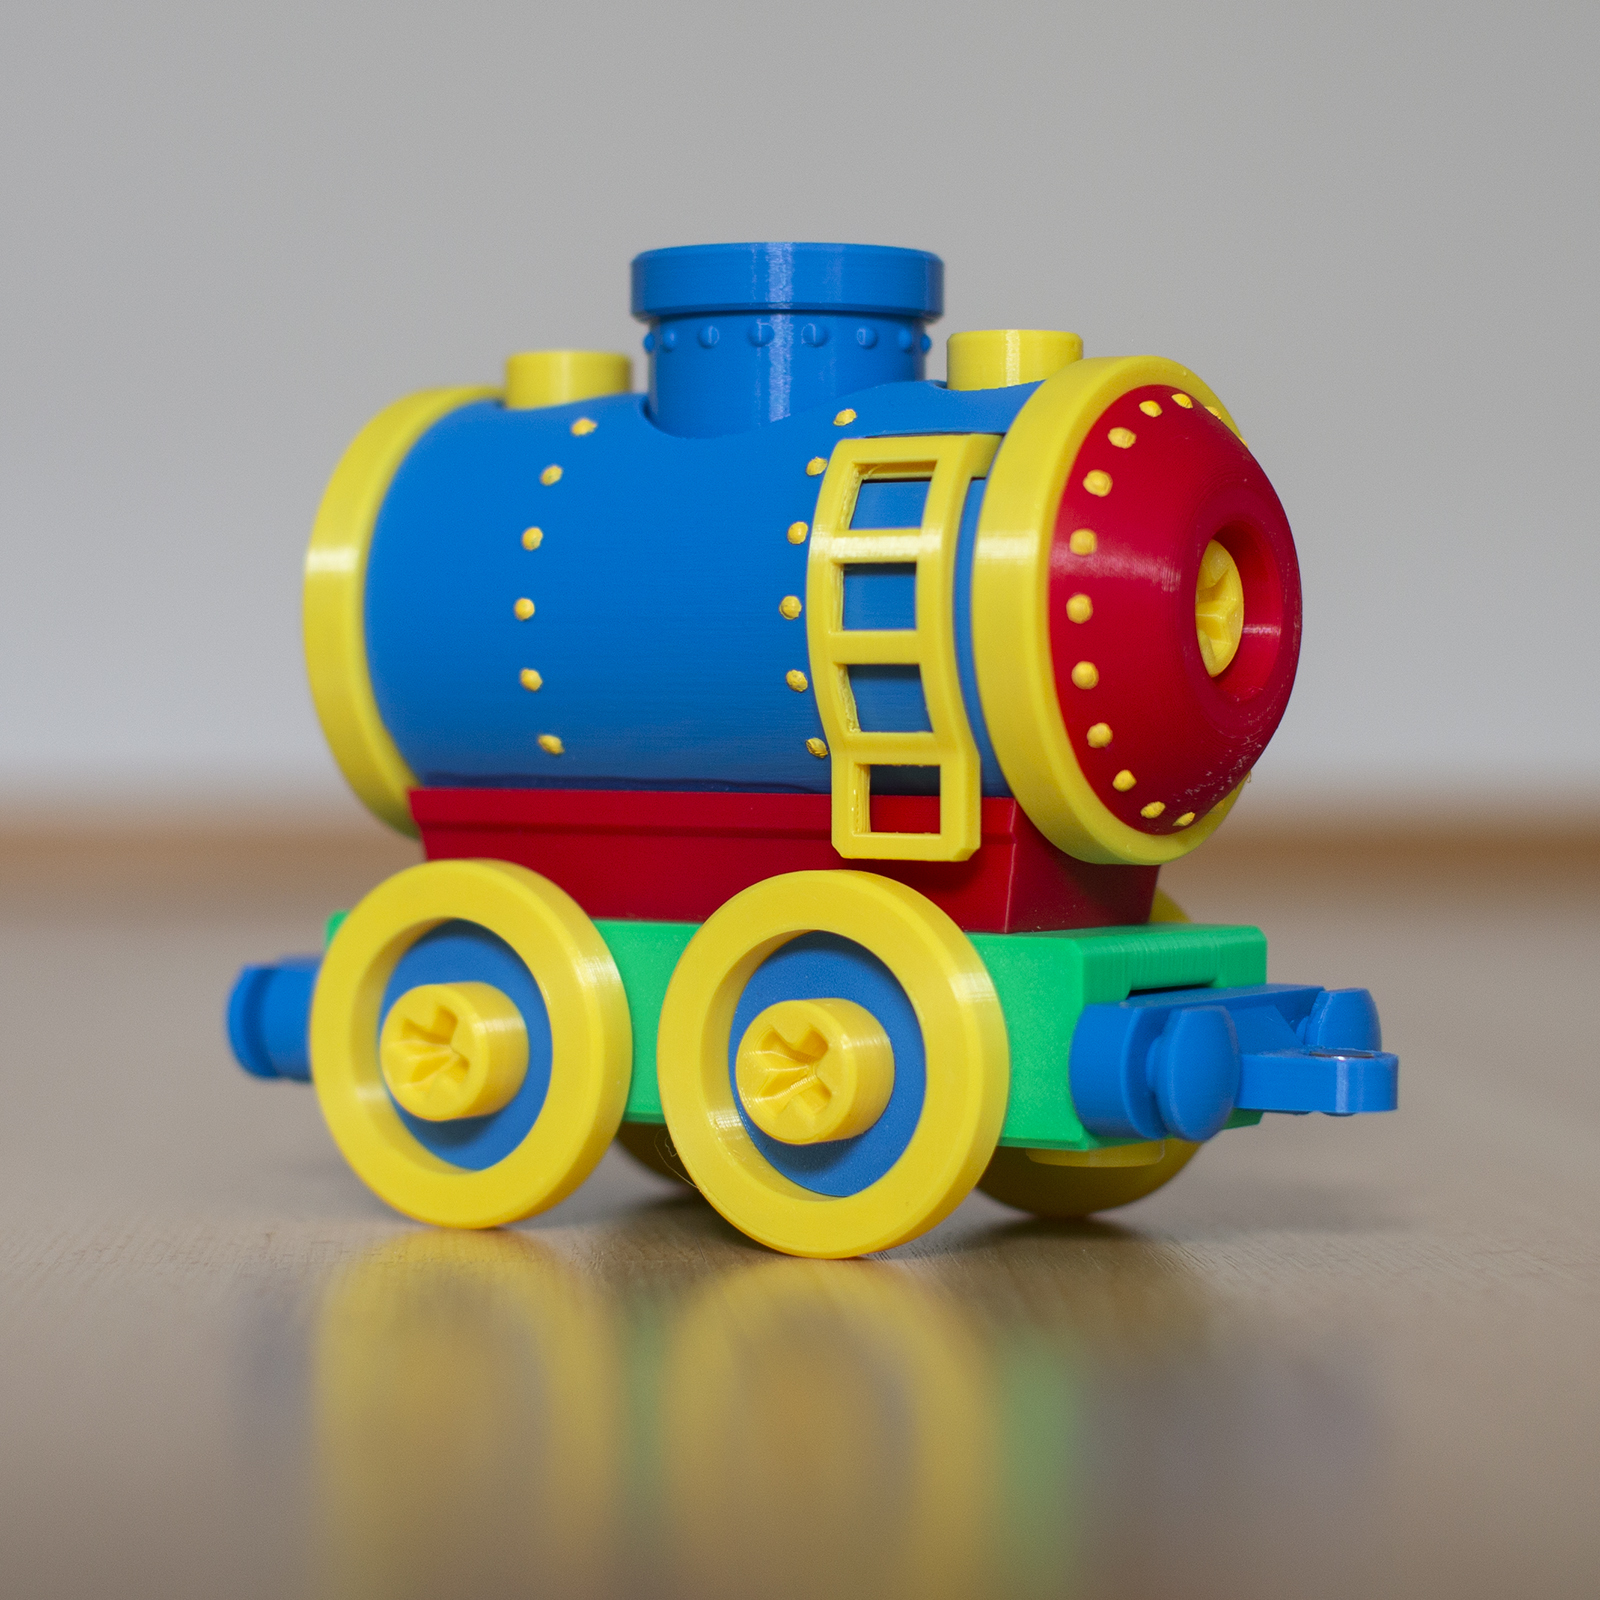 tanker.jpg Download STL file Toy train construction set - whole train combo • 3D print object, kozakm